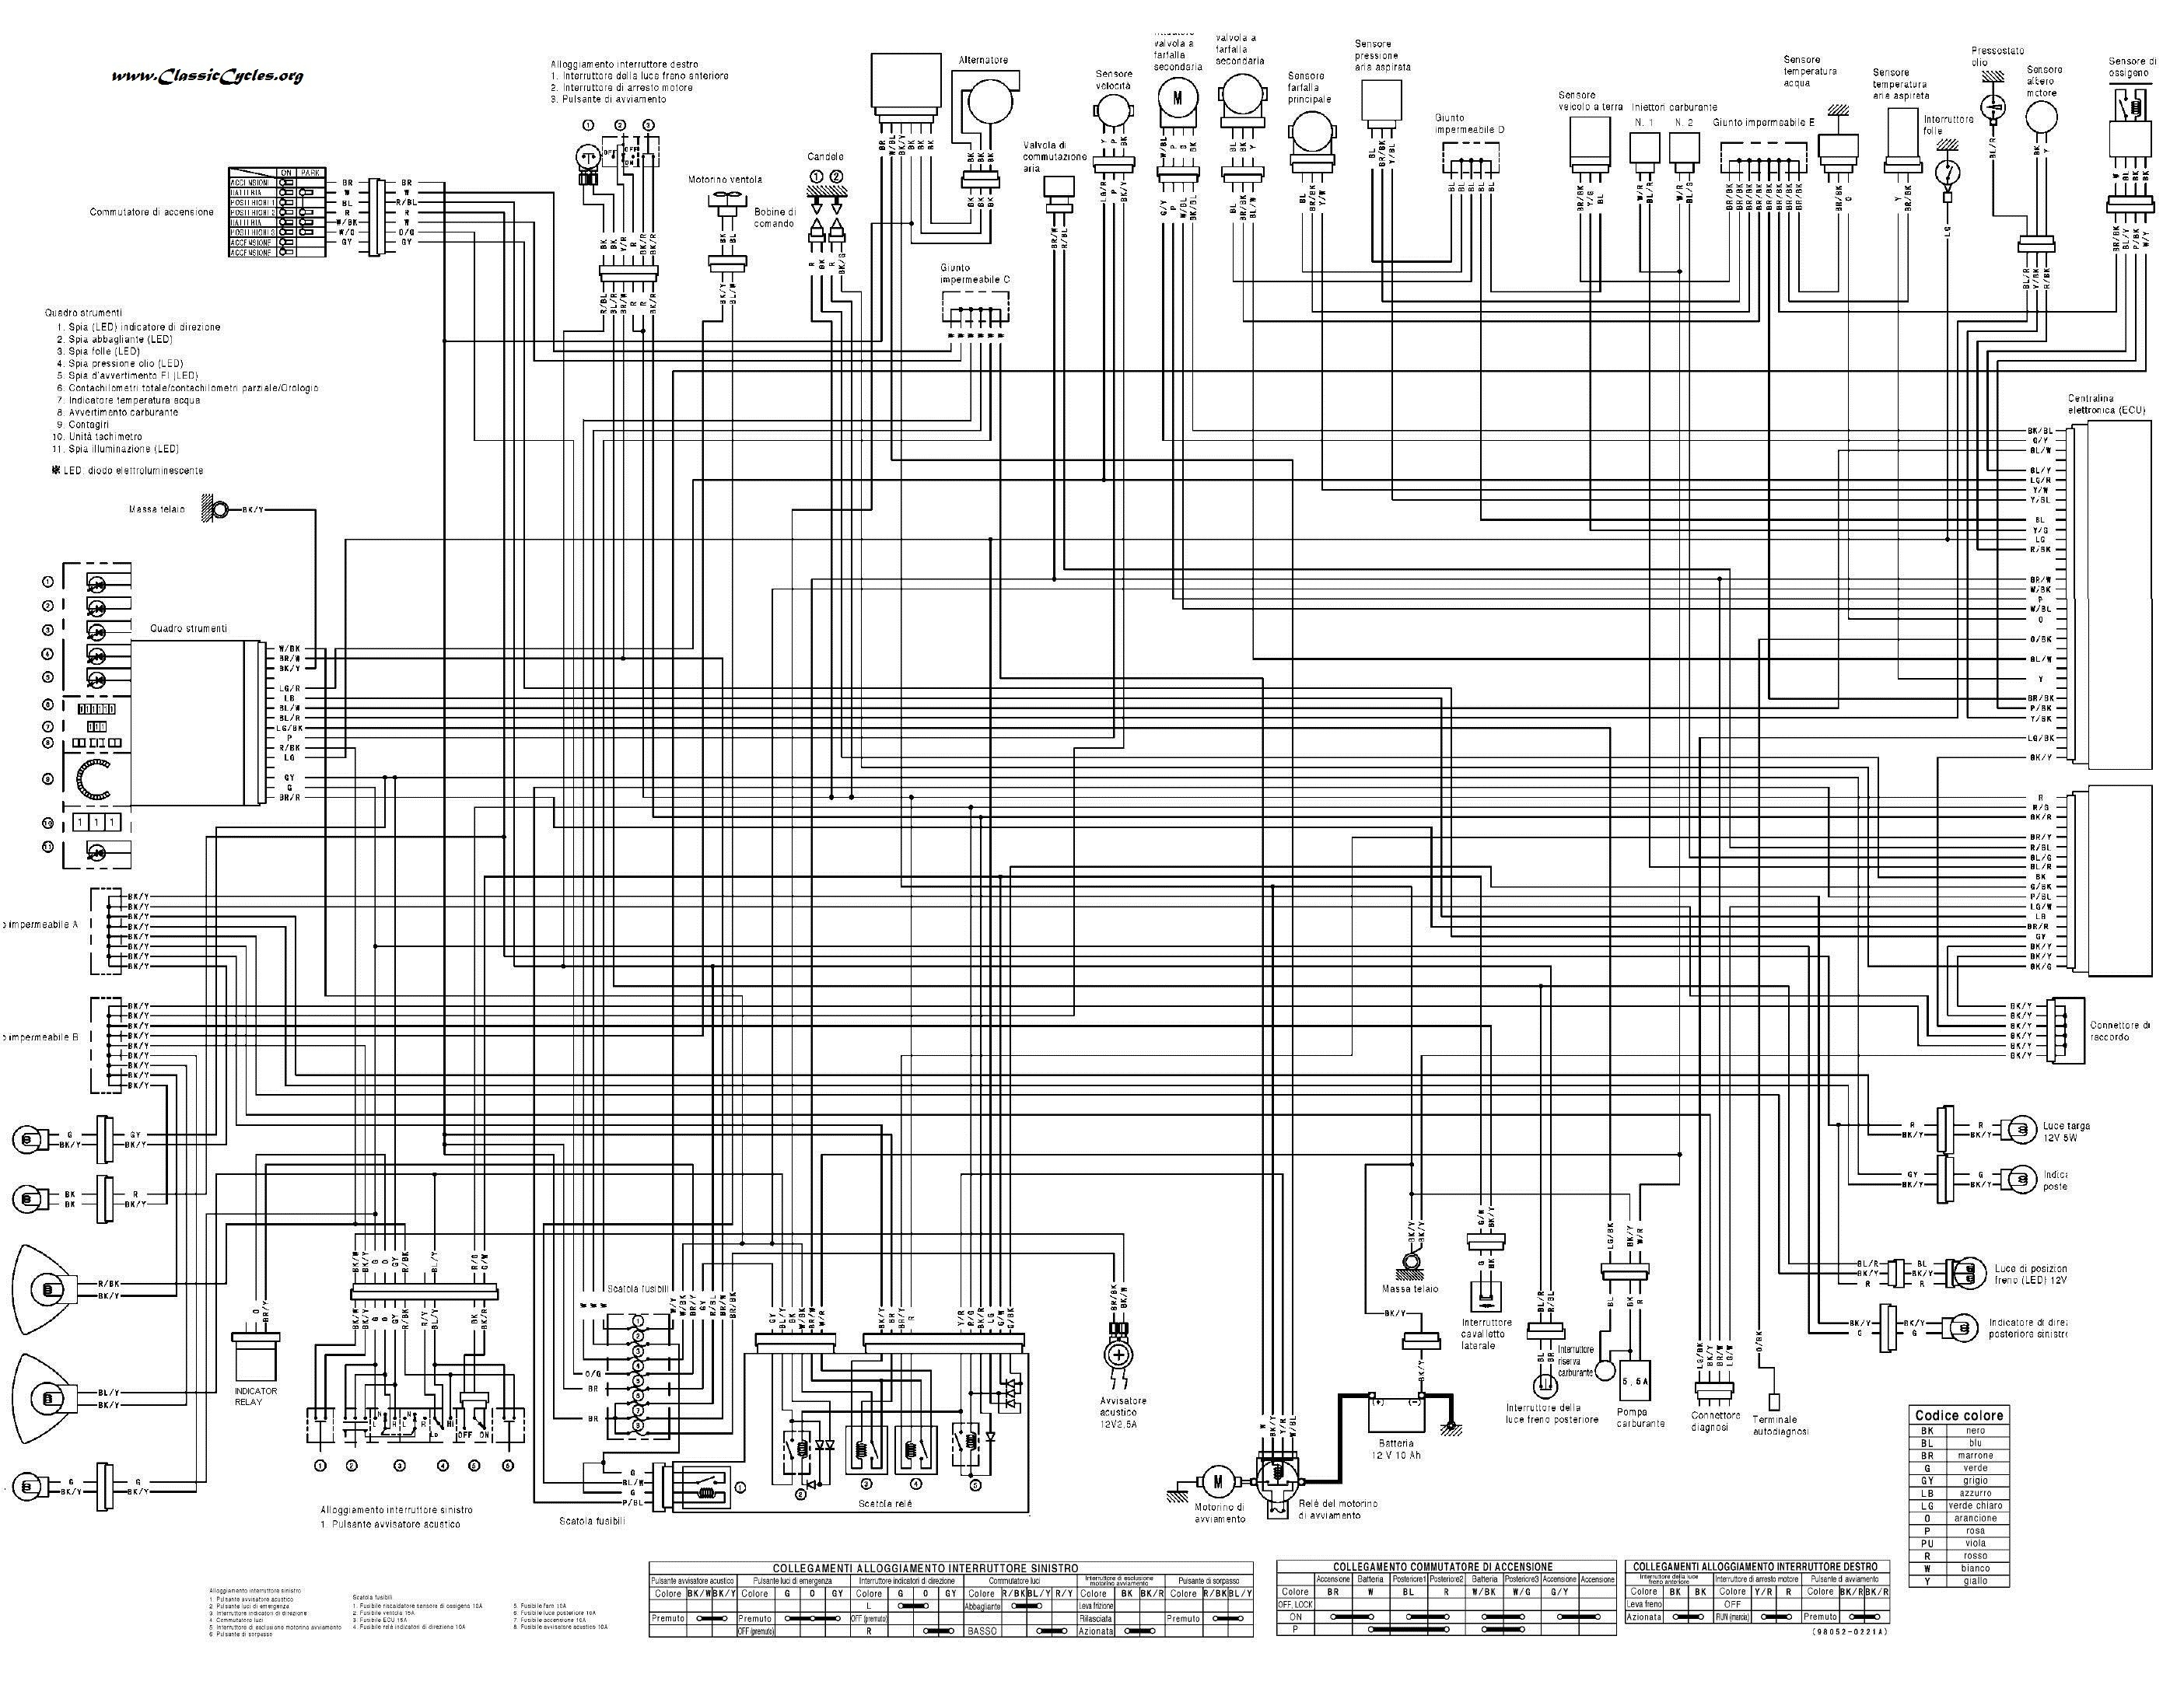 Classic Car Wiring Diagrams Car Wiring Diagrams Carburetor Get Free Image About Wiring Diagram Of Classic Car Wiring Diagrams